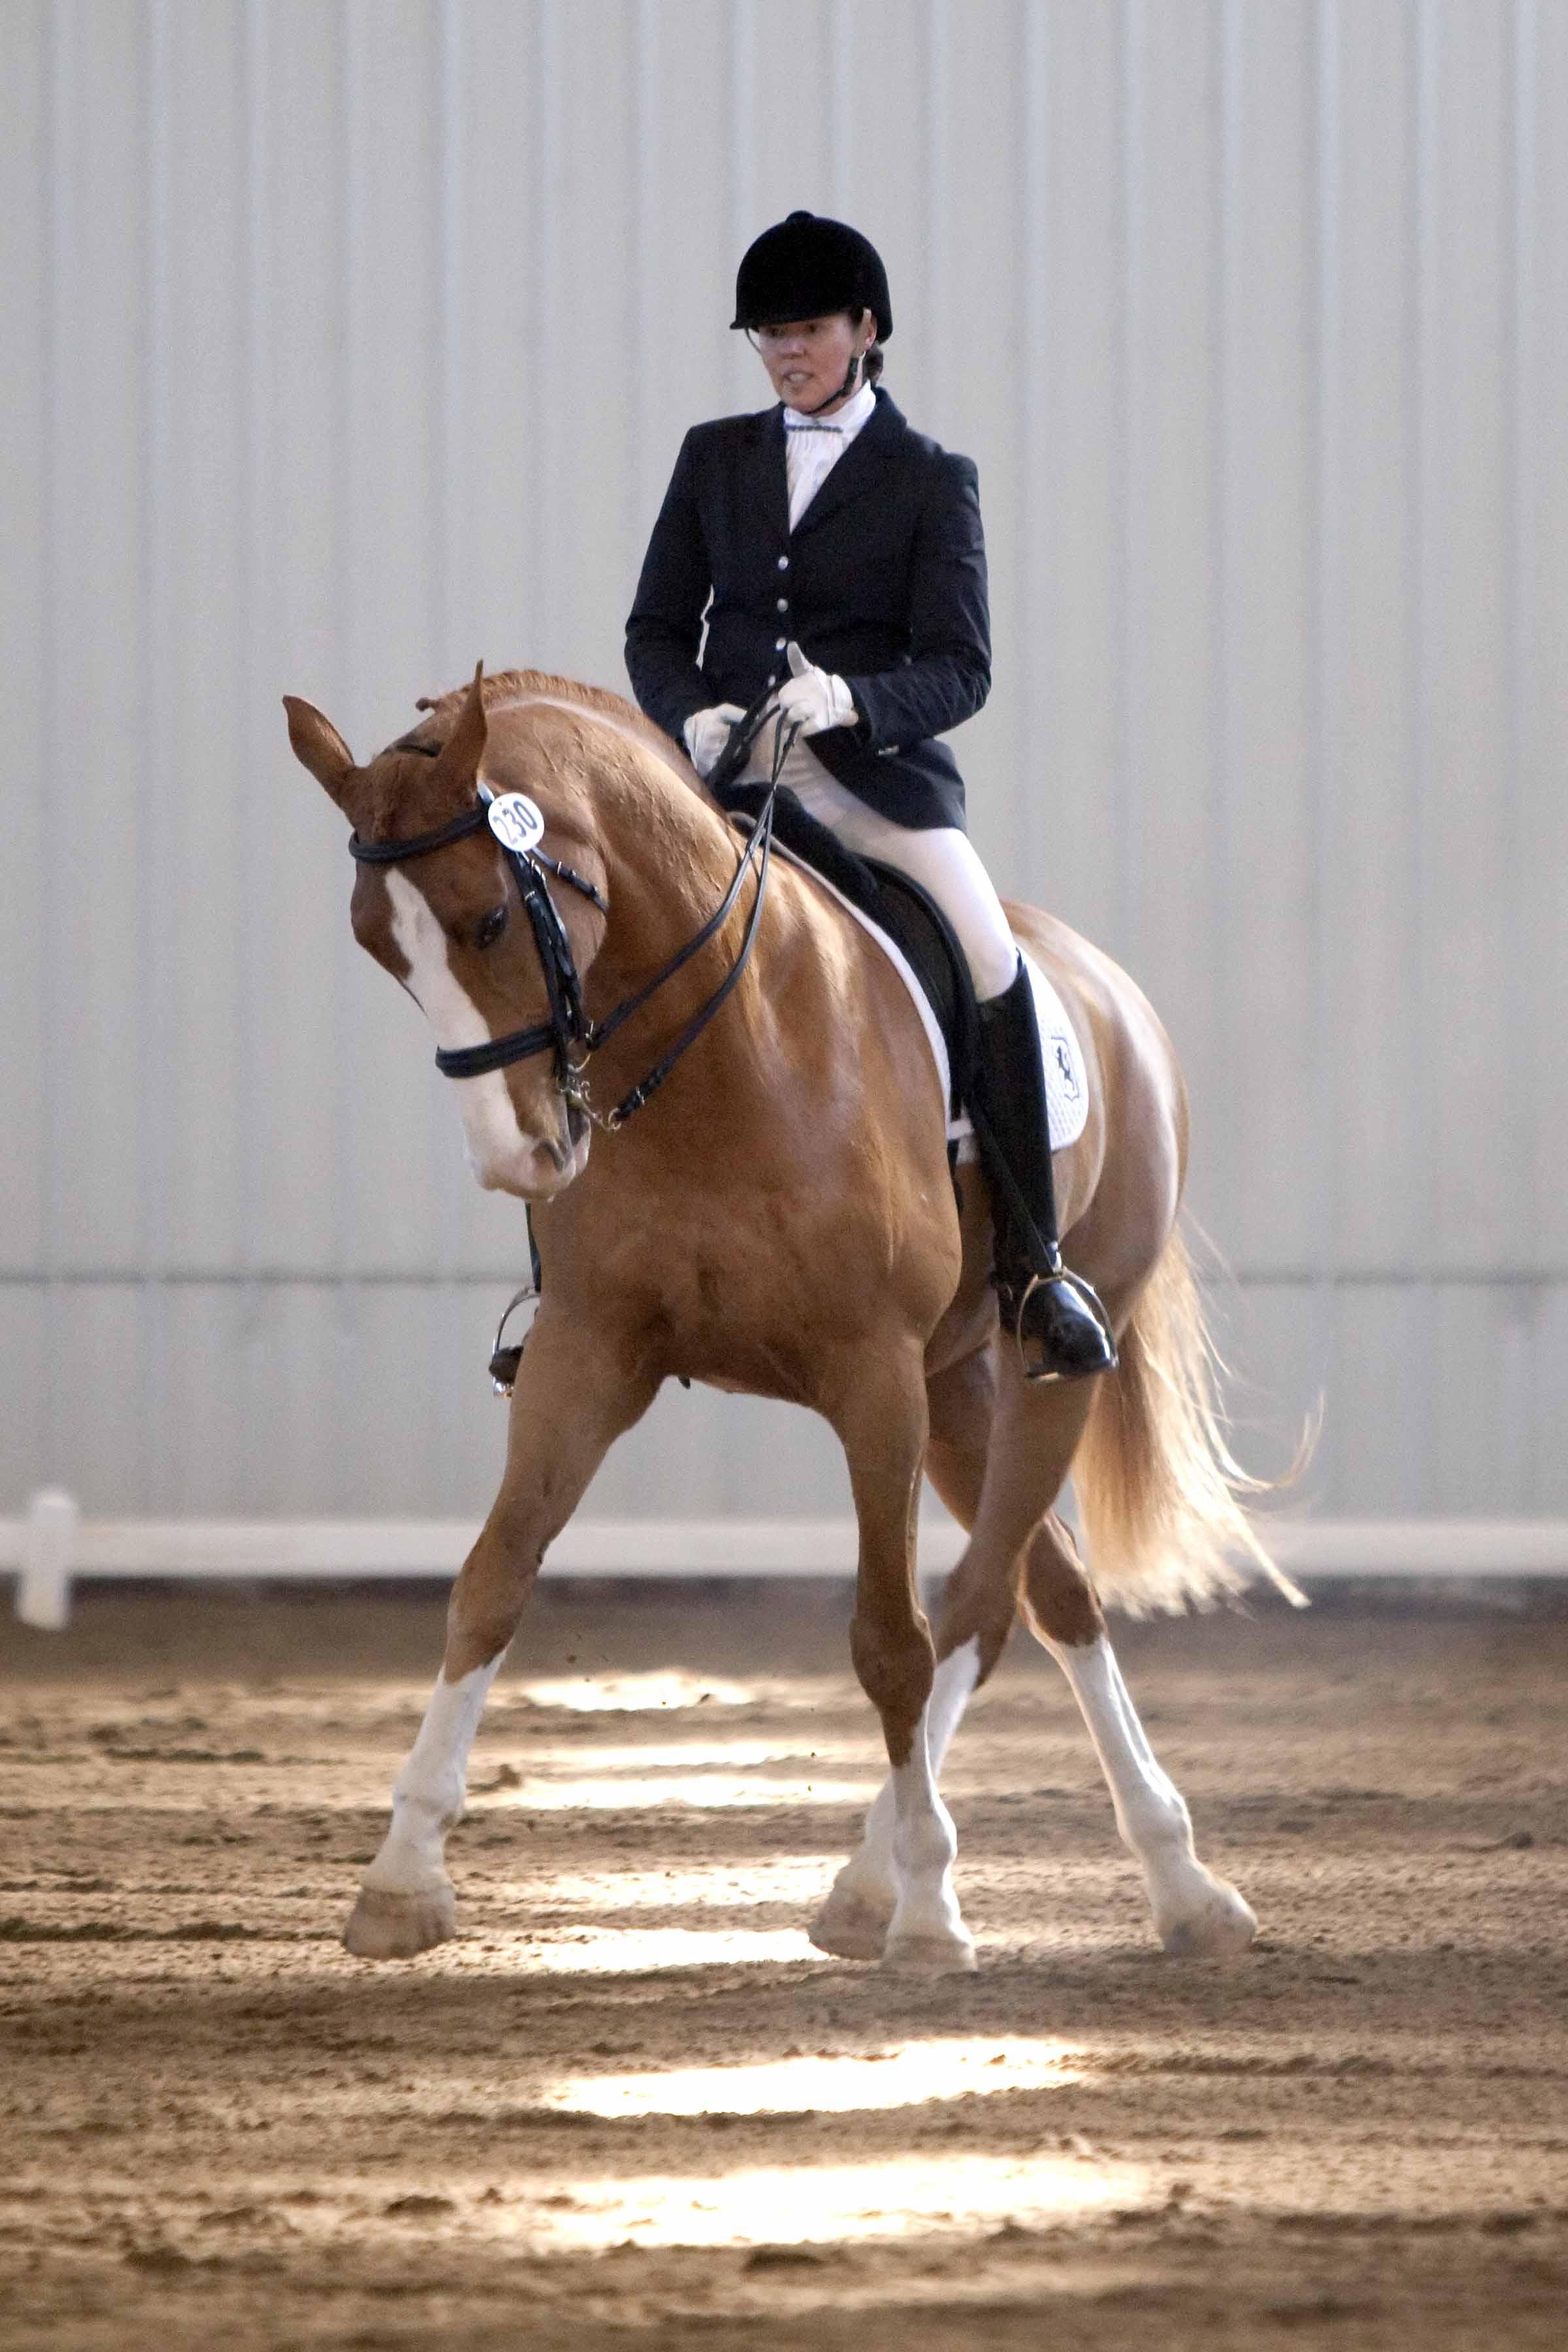 Tracy Uihlein riding Toblerone